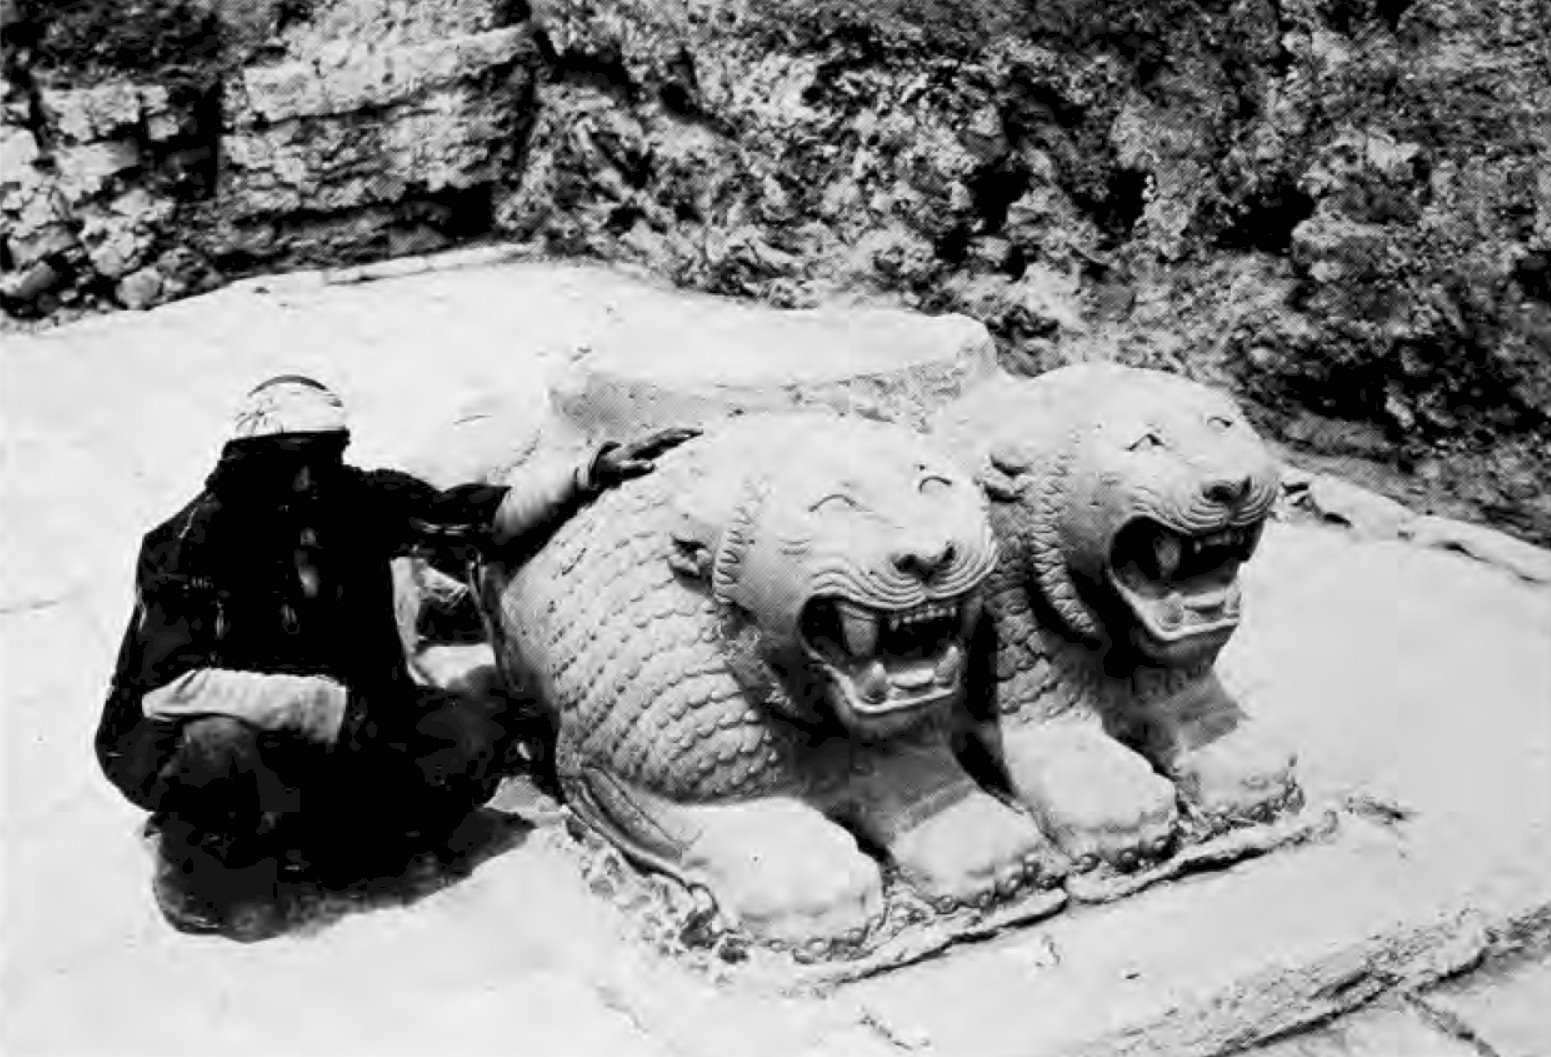 Hittite Monuments - Tell Tayinat